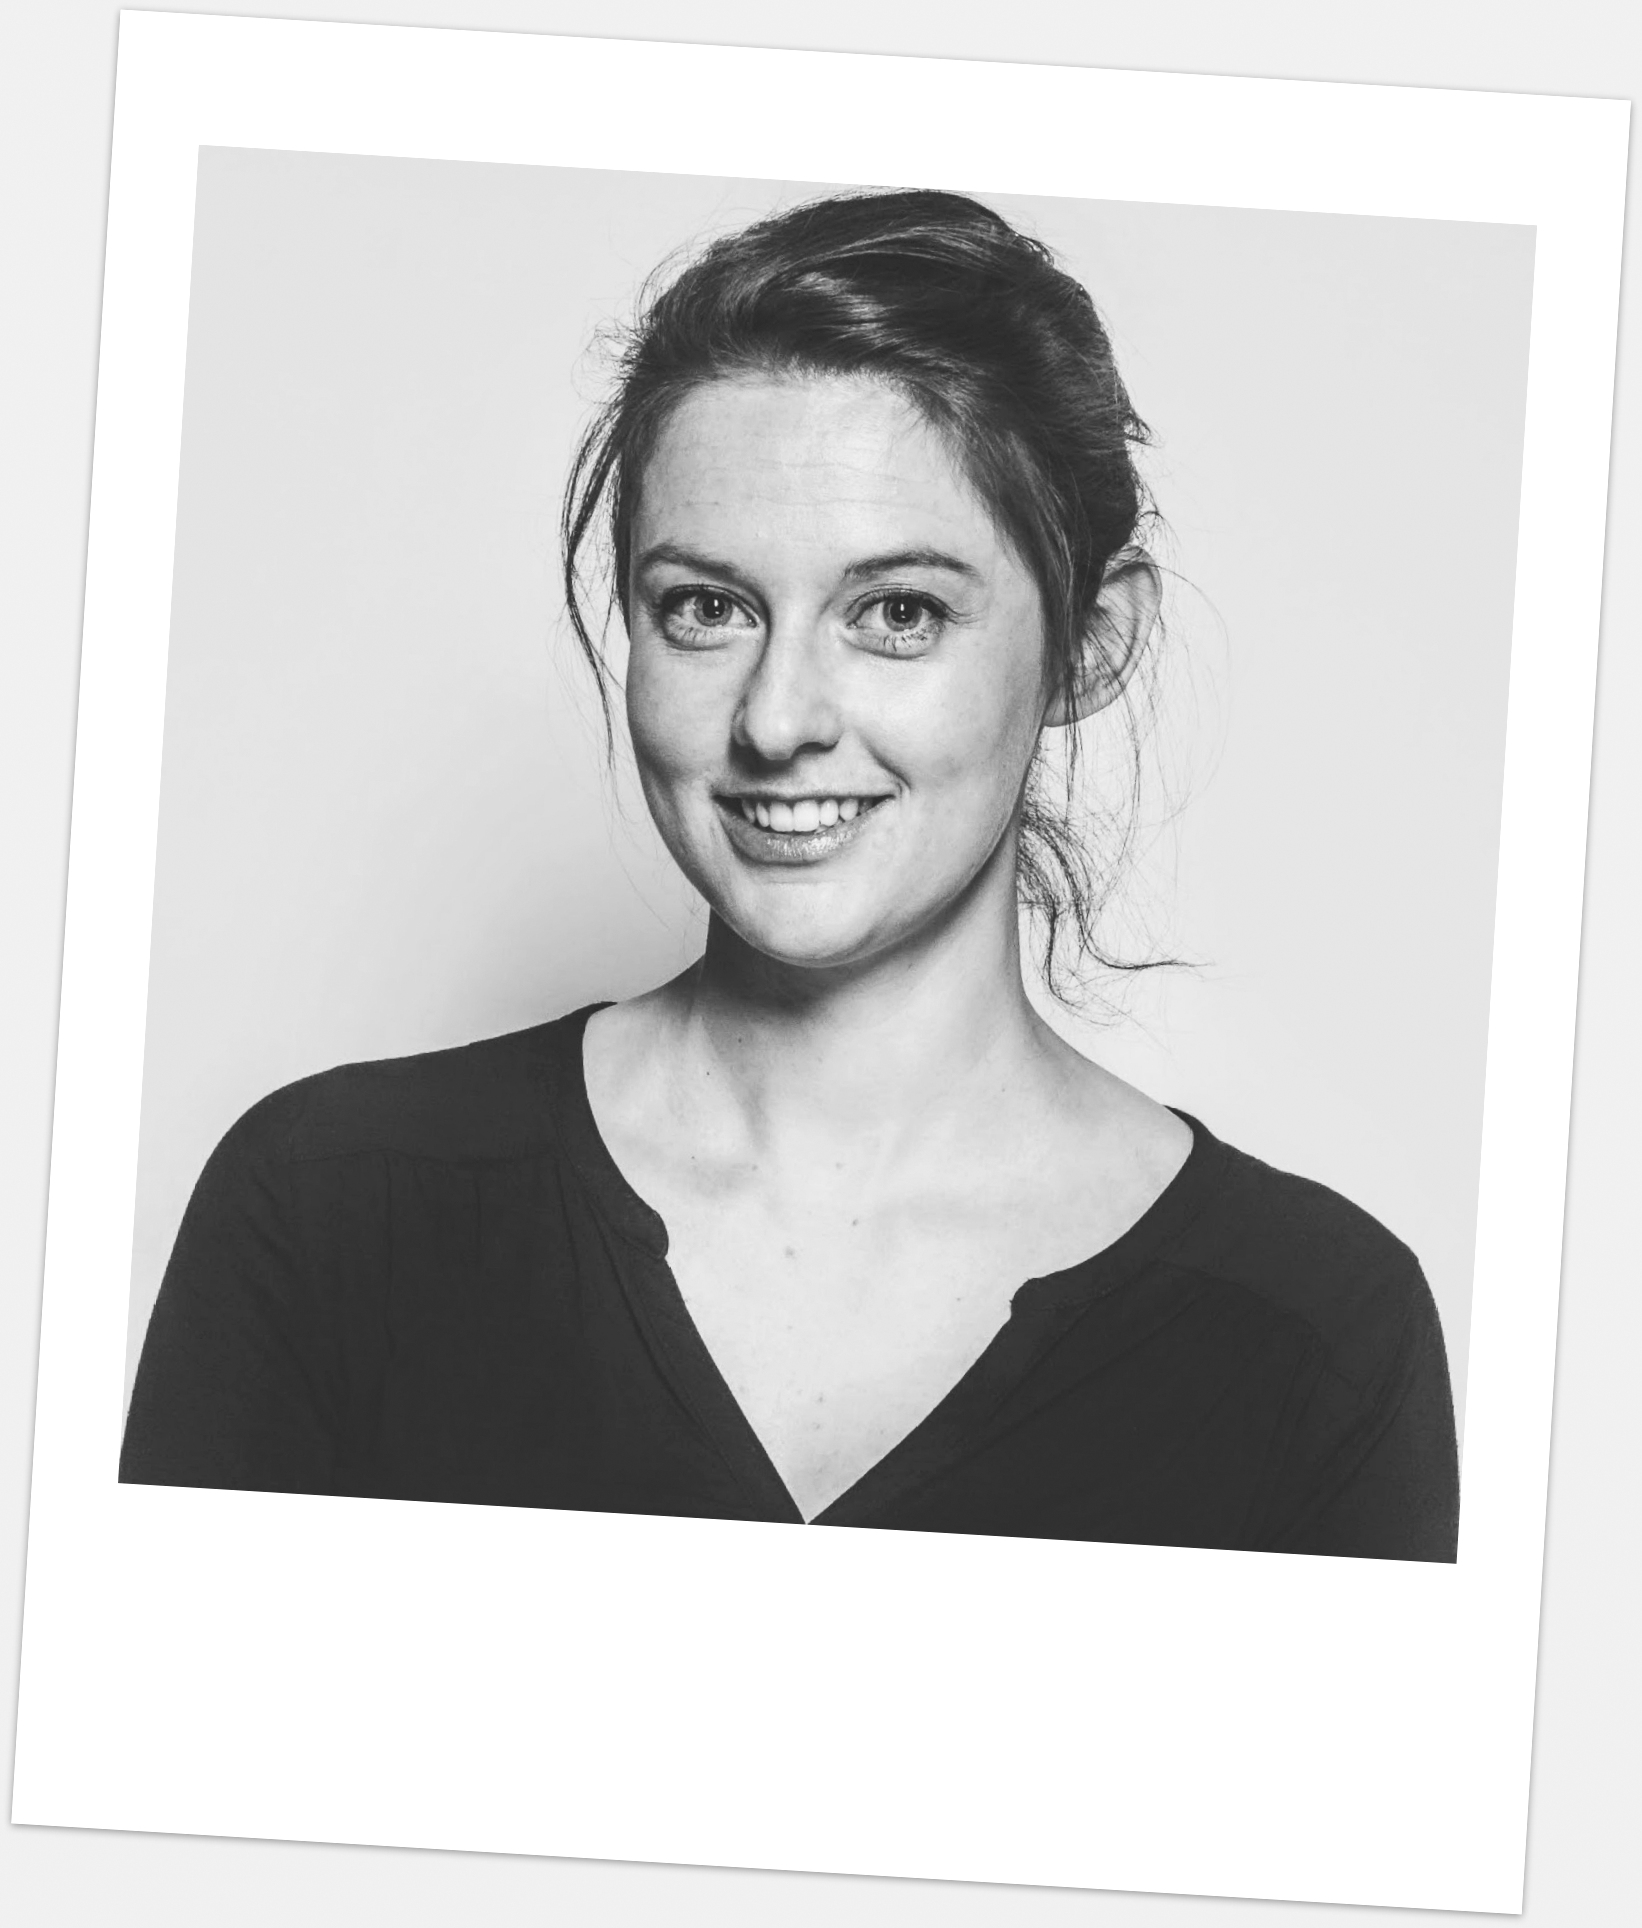 Helen - Producer /  Editor